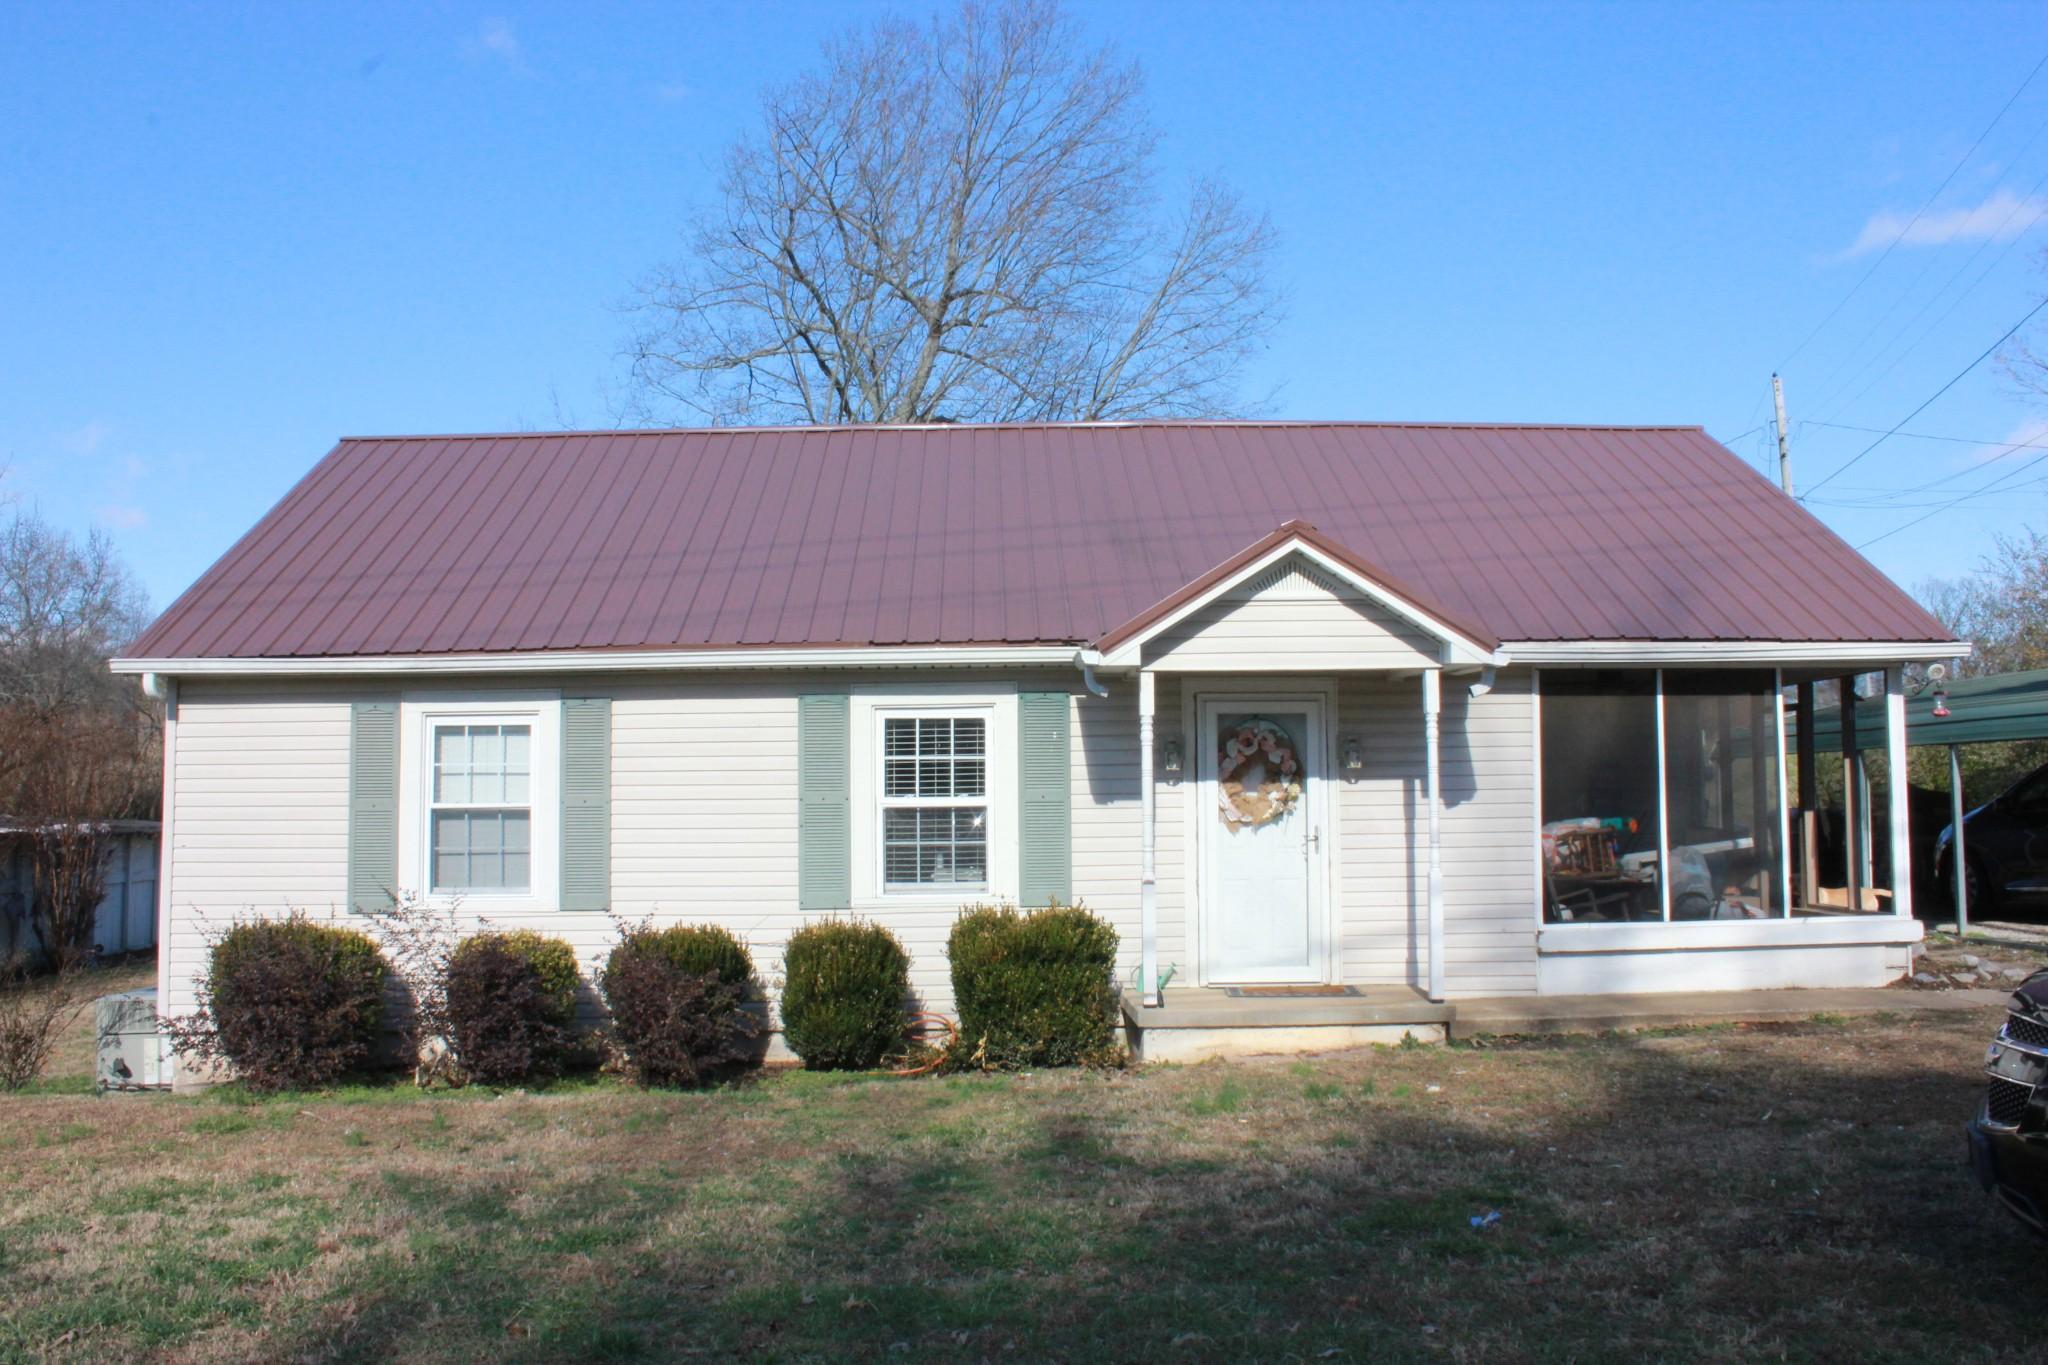 908 N Main St, Saint Joseph, TN 38481 - Saint Joseph, TN real estate listing